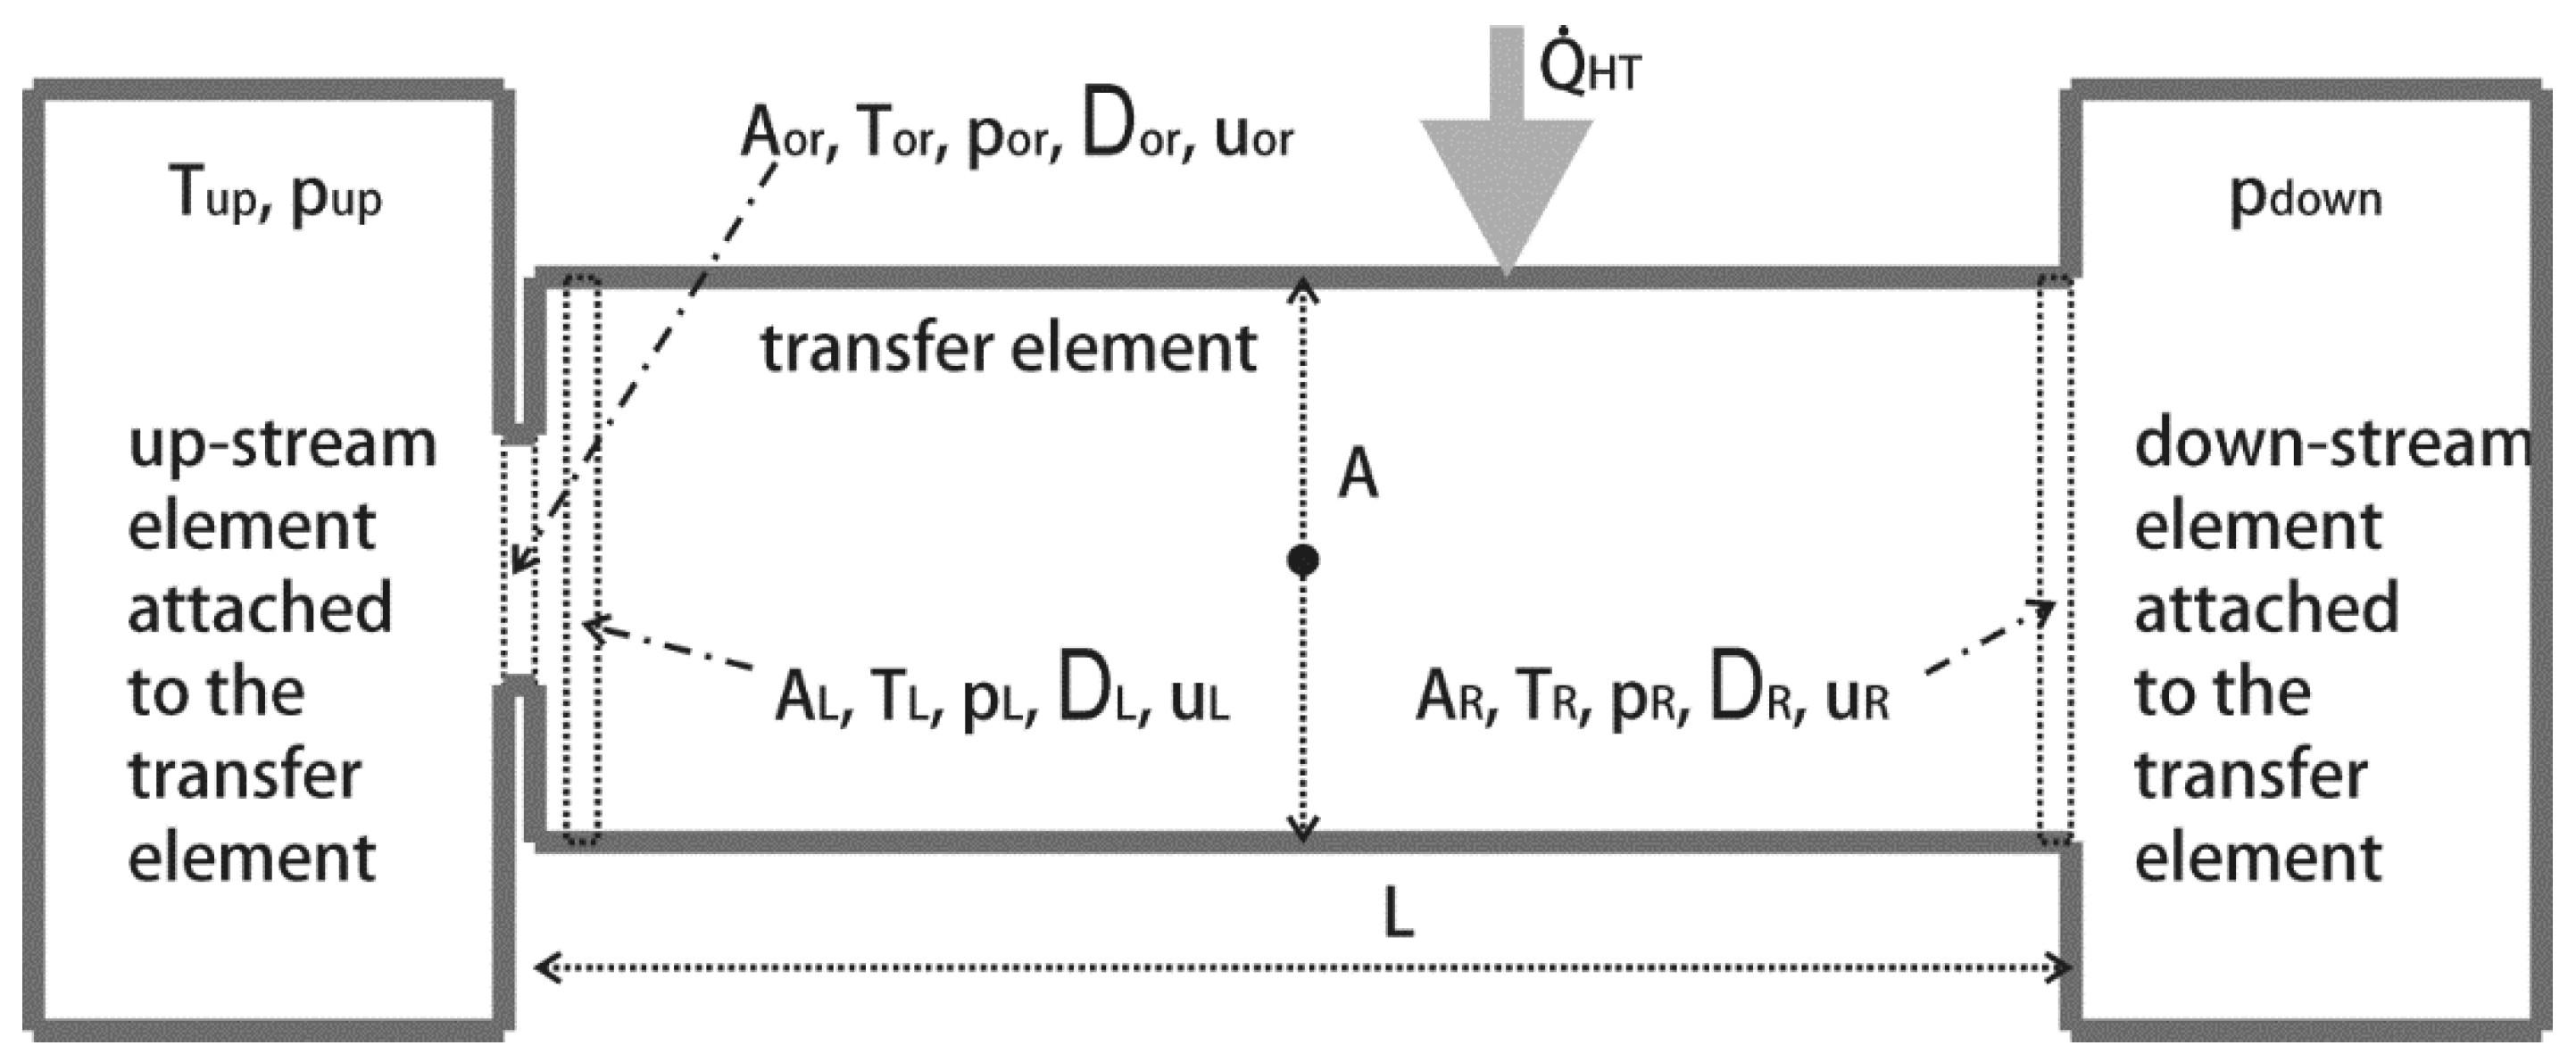 Internal Combustion Diagram Energies Free Full Text Of Internal Combustion Diagram